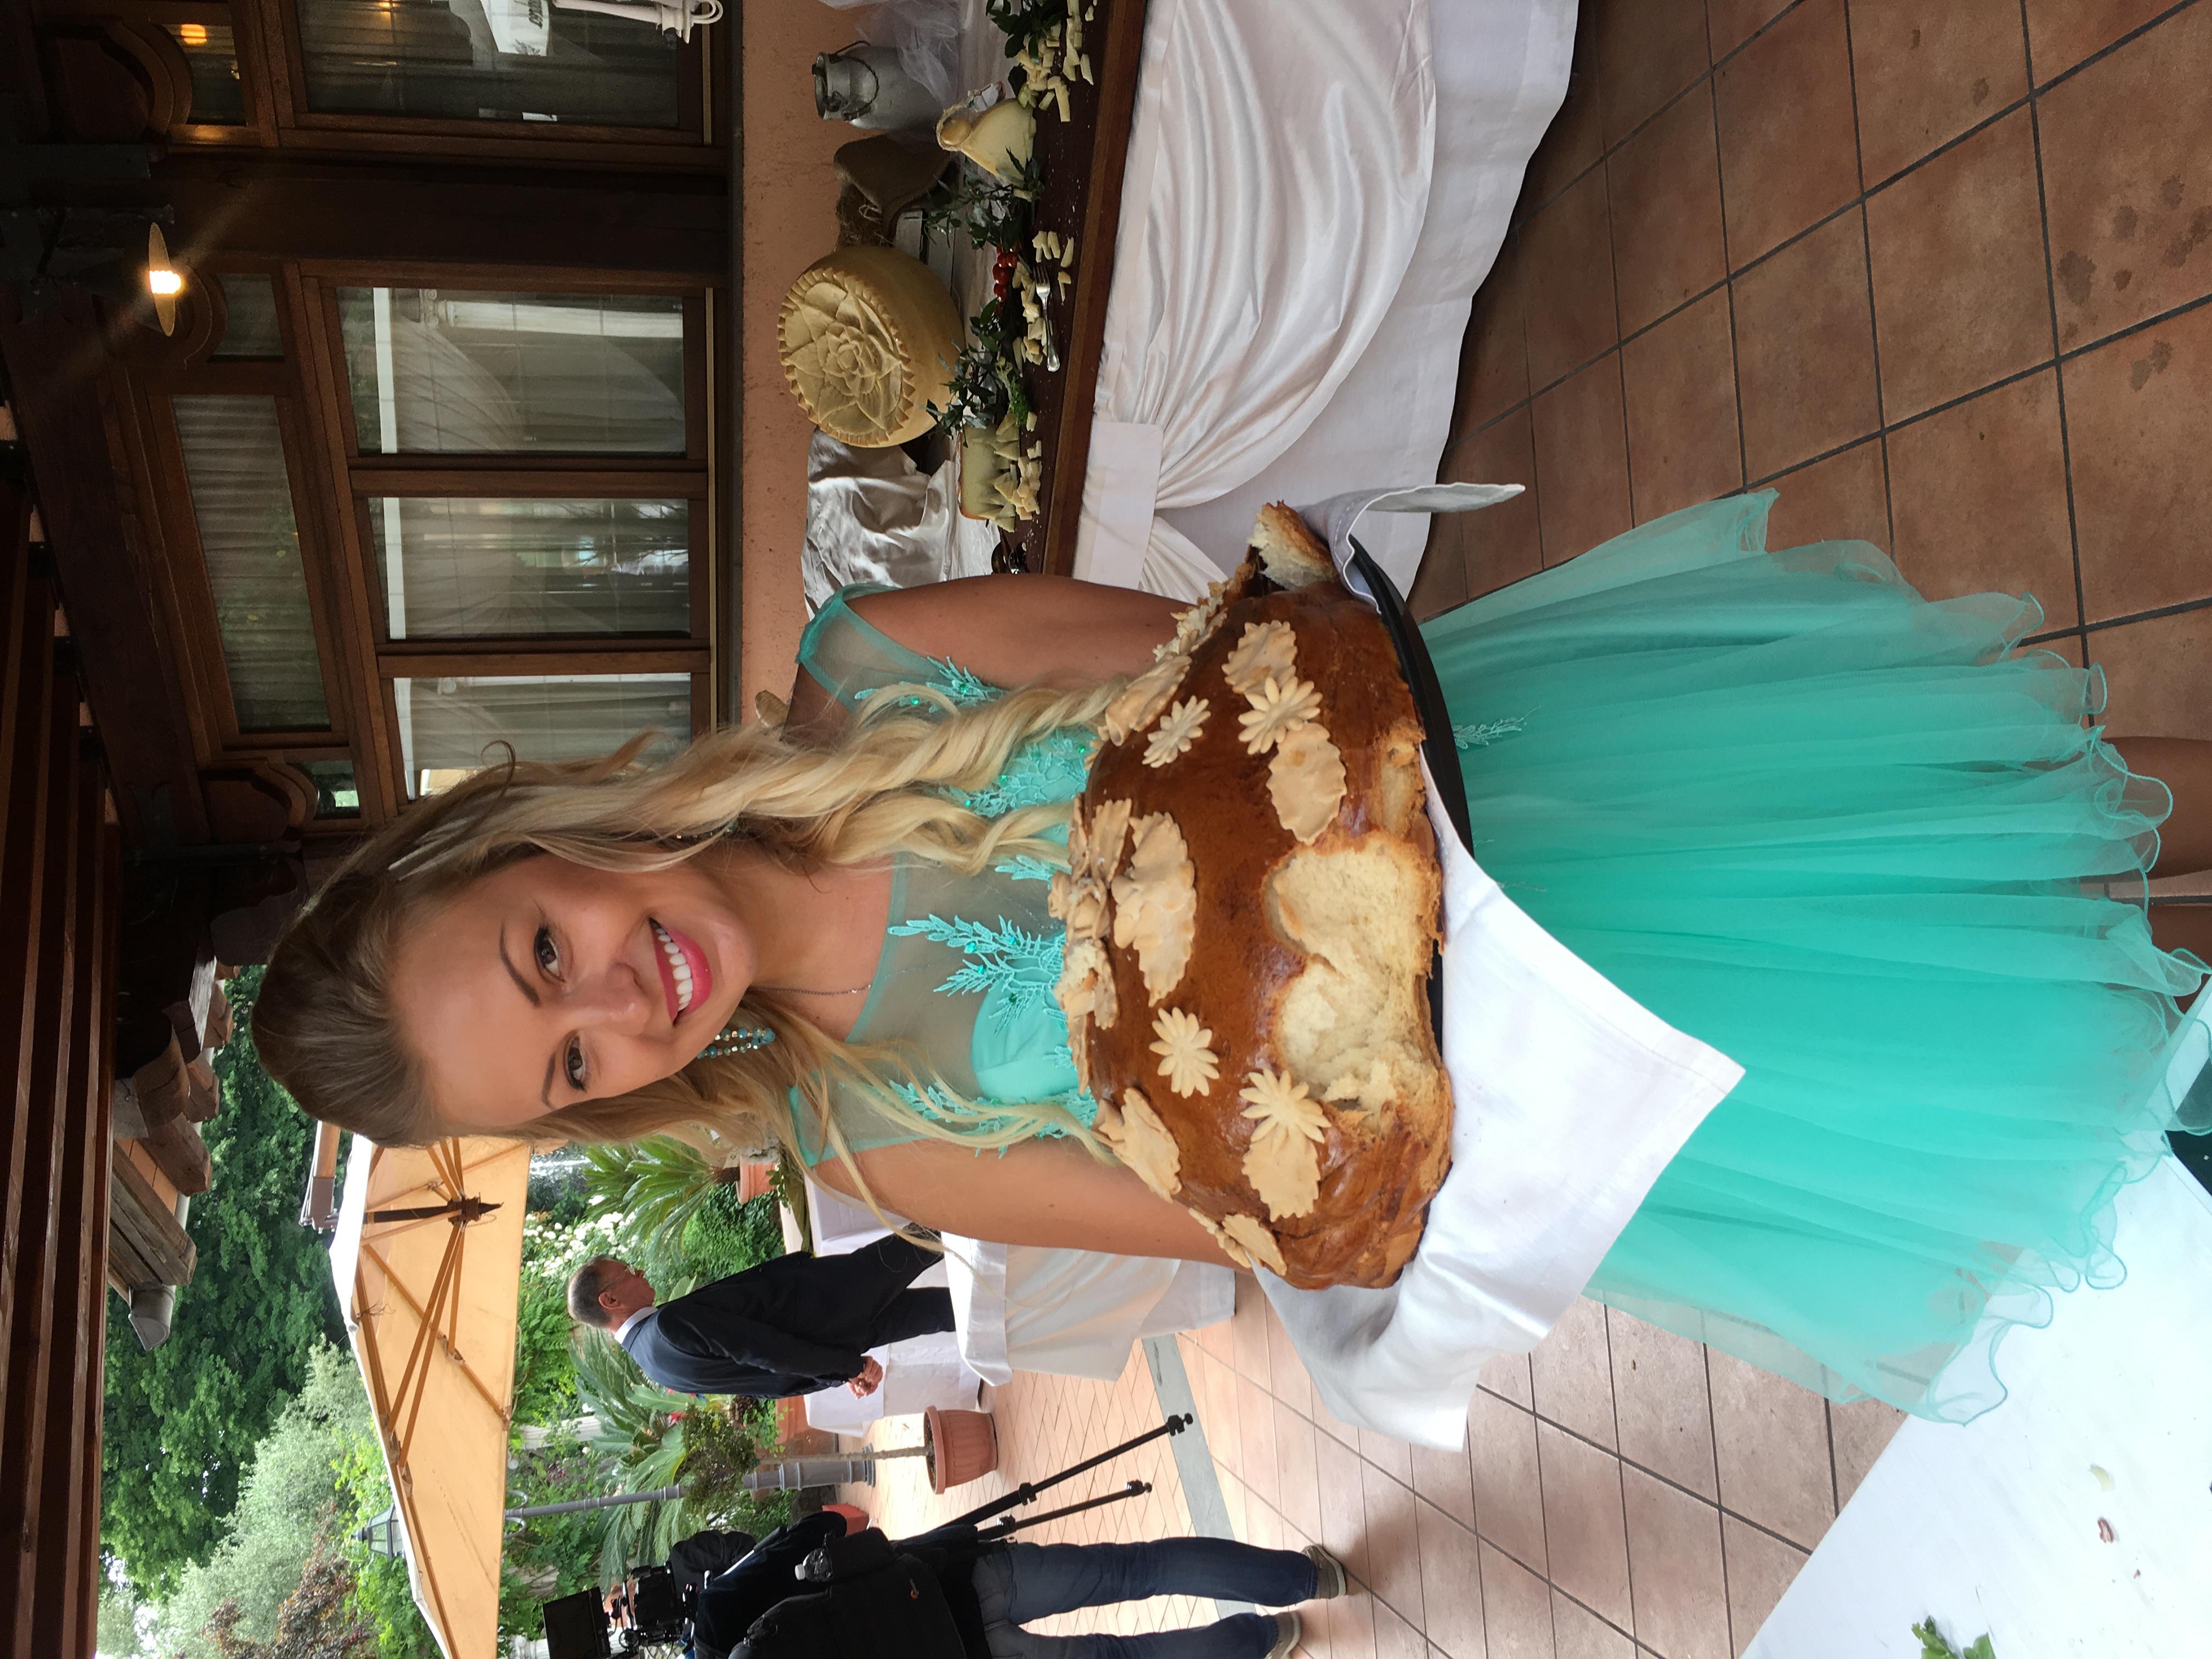 Фото 11 свадьба в Риме | Лидия и Оттавио | ведущая в Италии - Катрин Моро